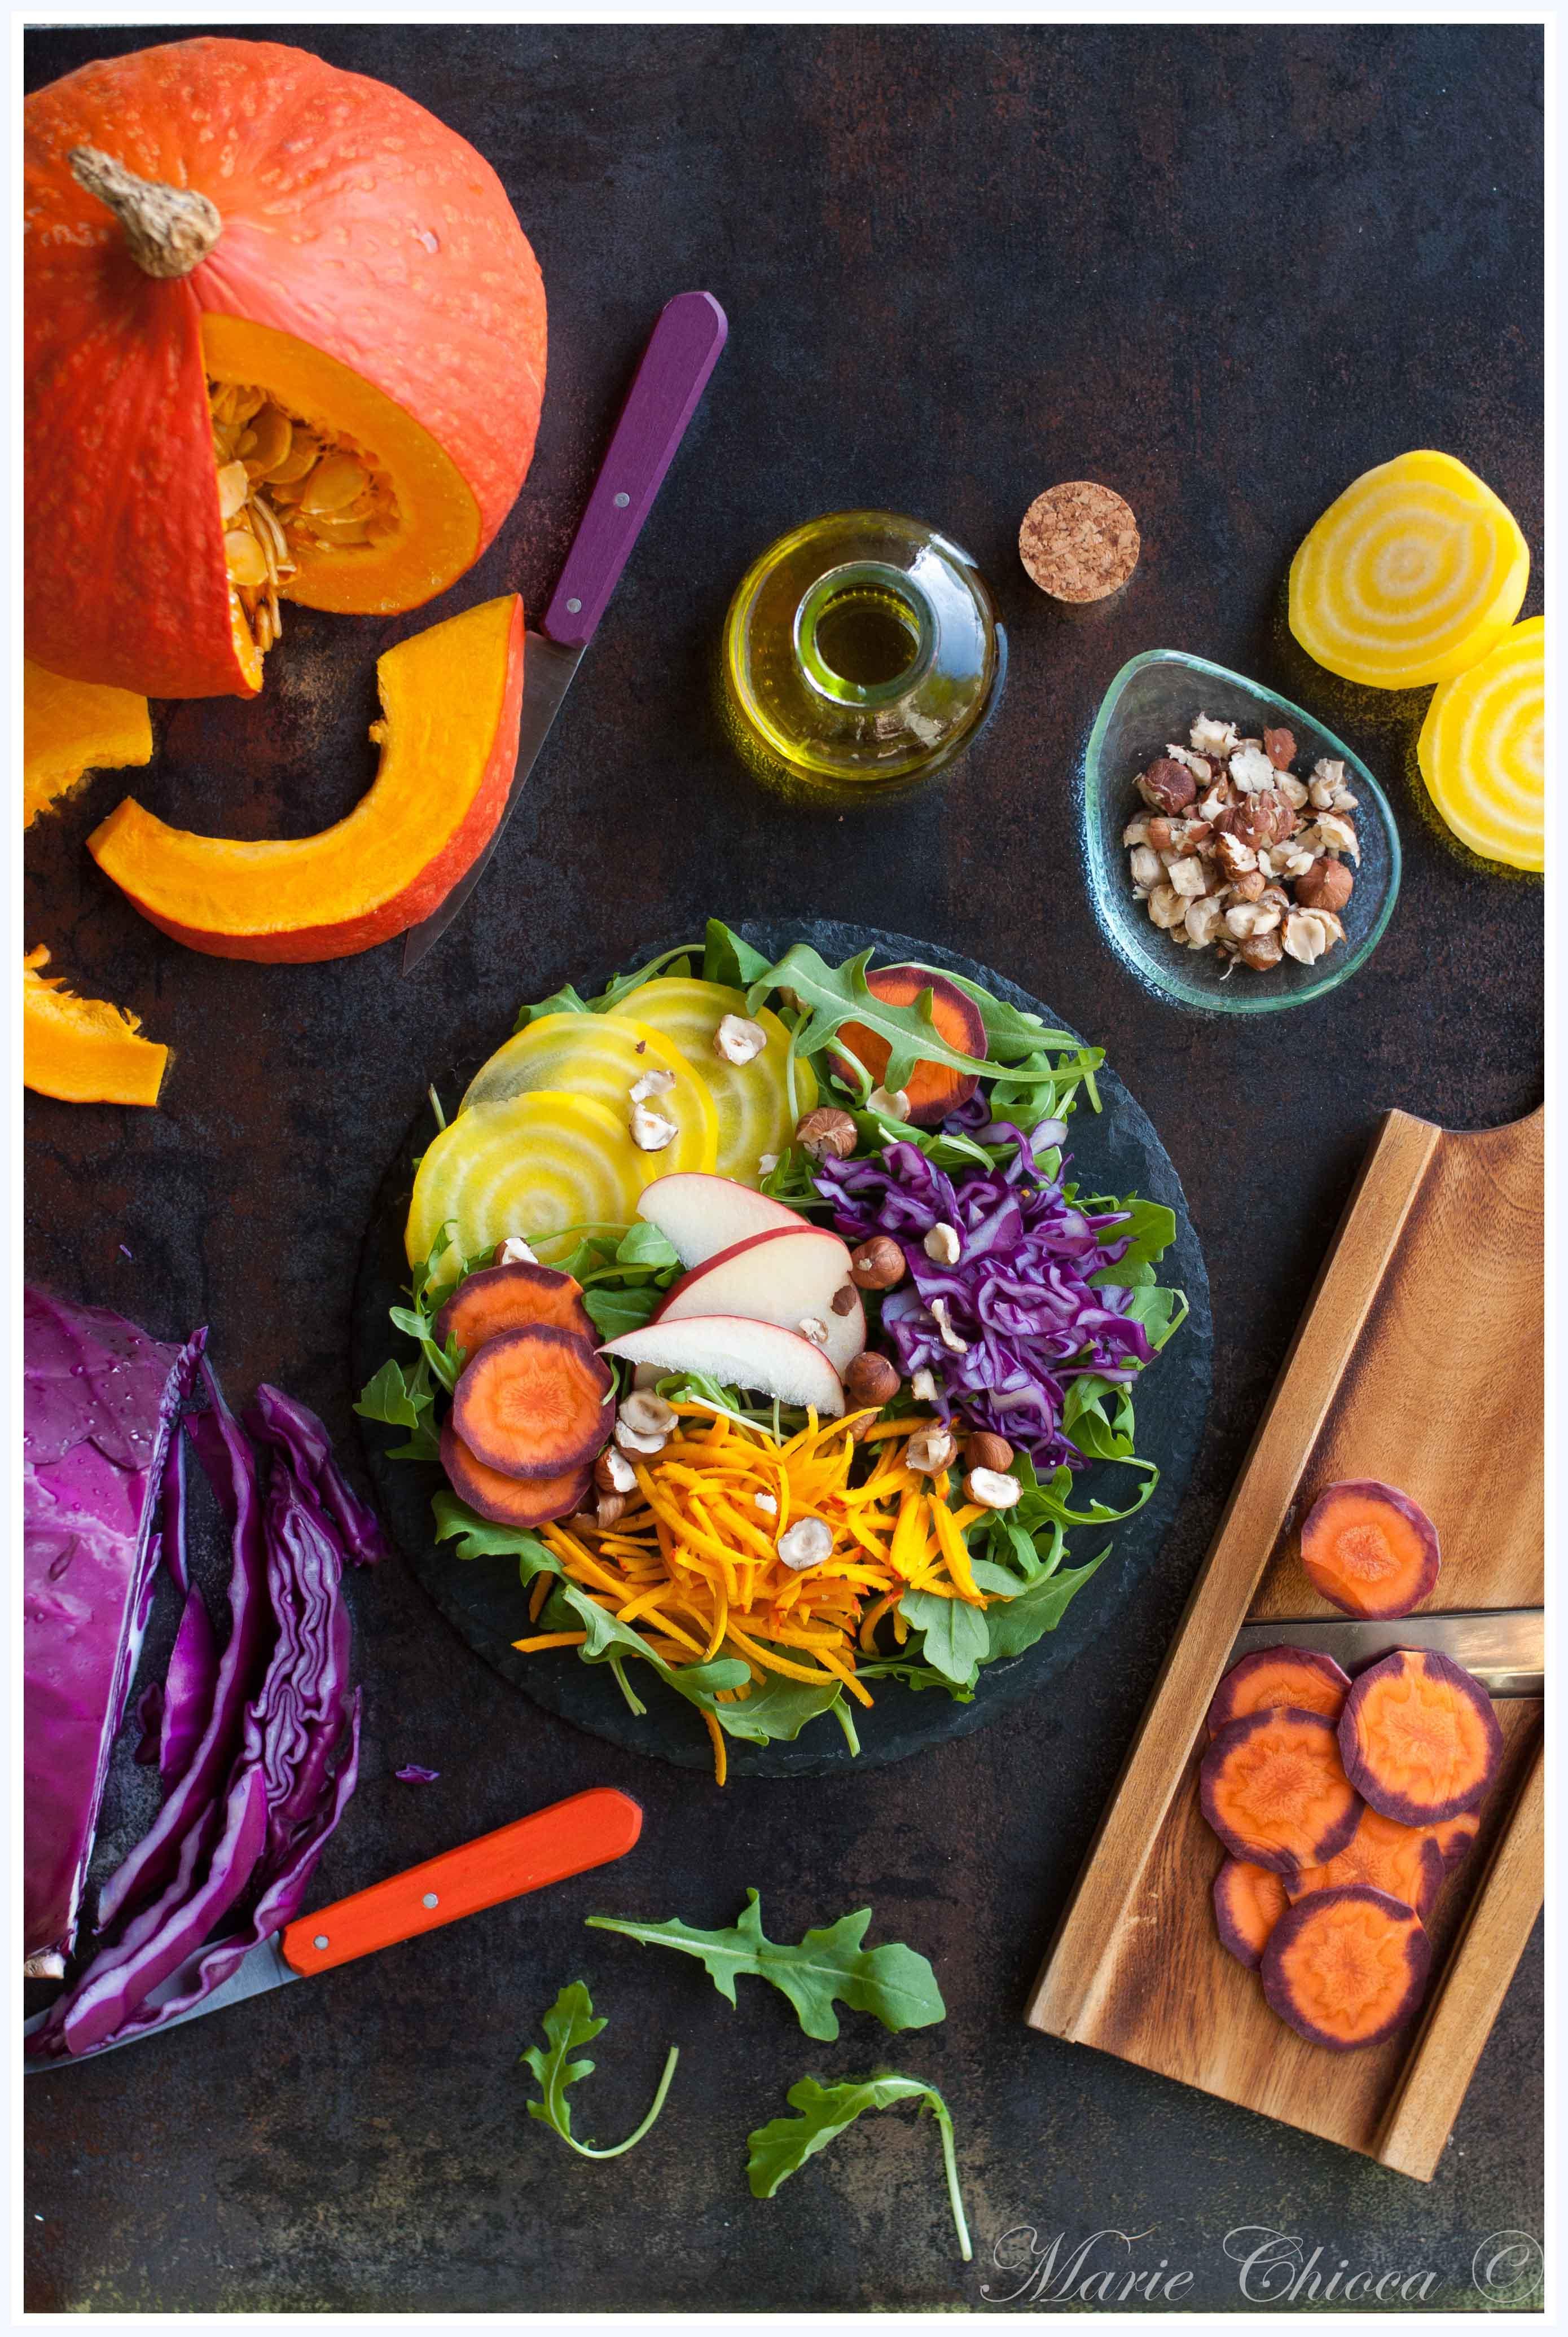 salade-dautomne-au-potimarron-2-ne-surtout-pas-recadrer-2